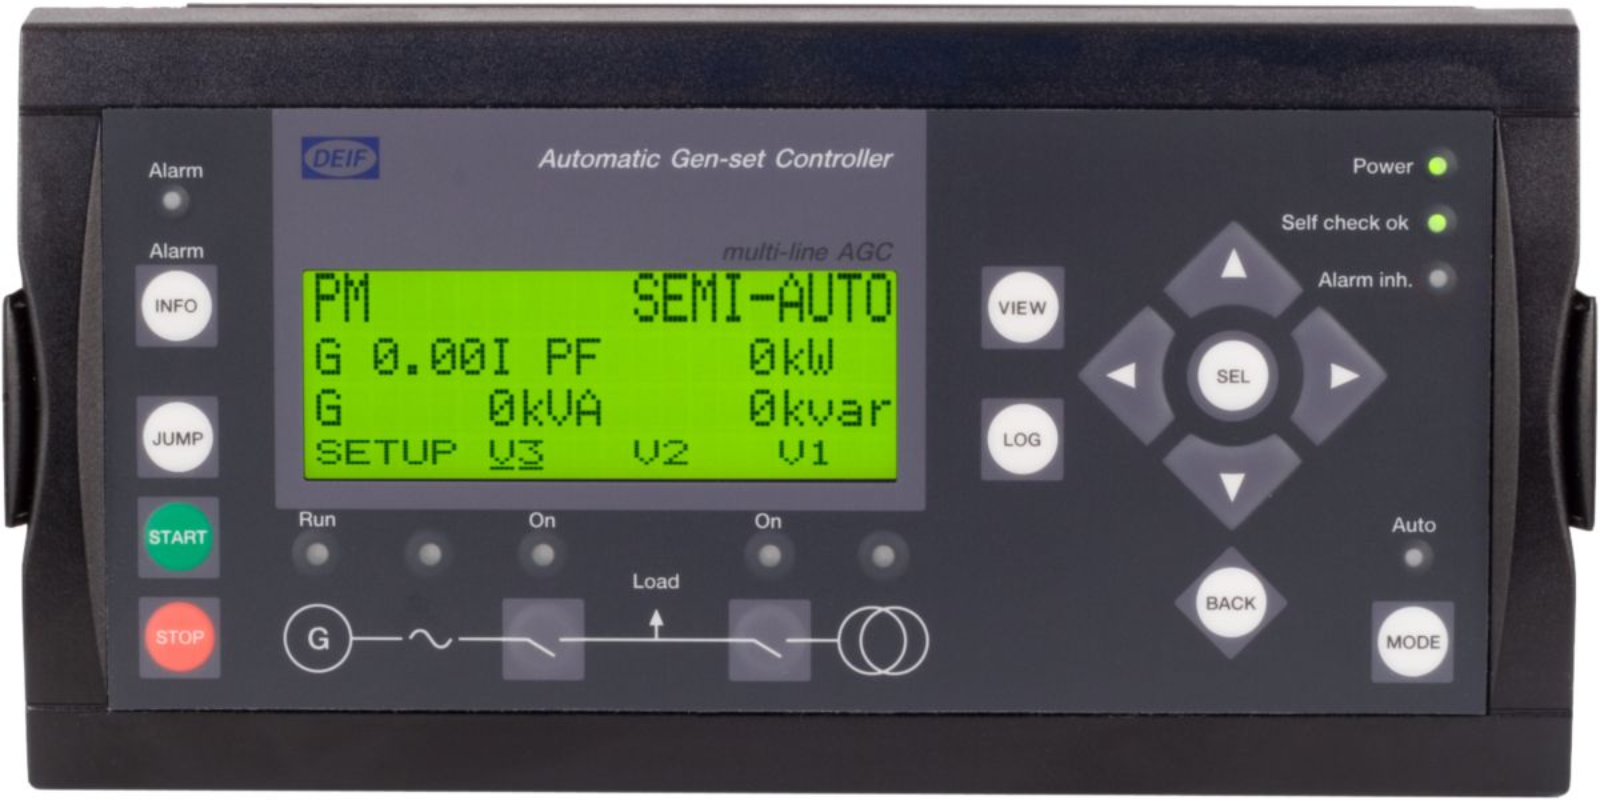 DEIF control panel